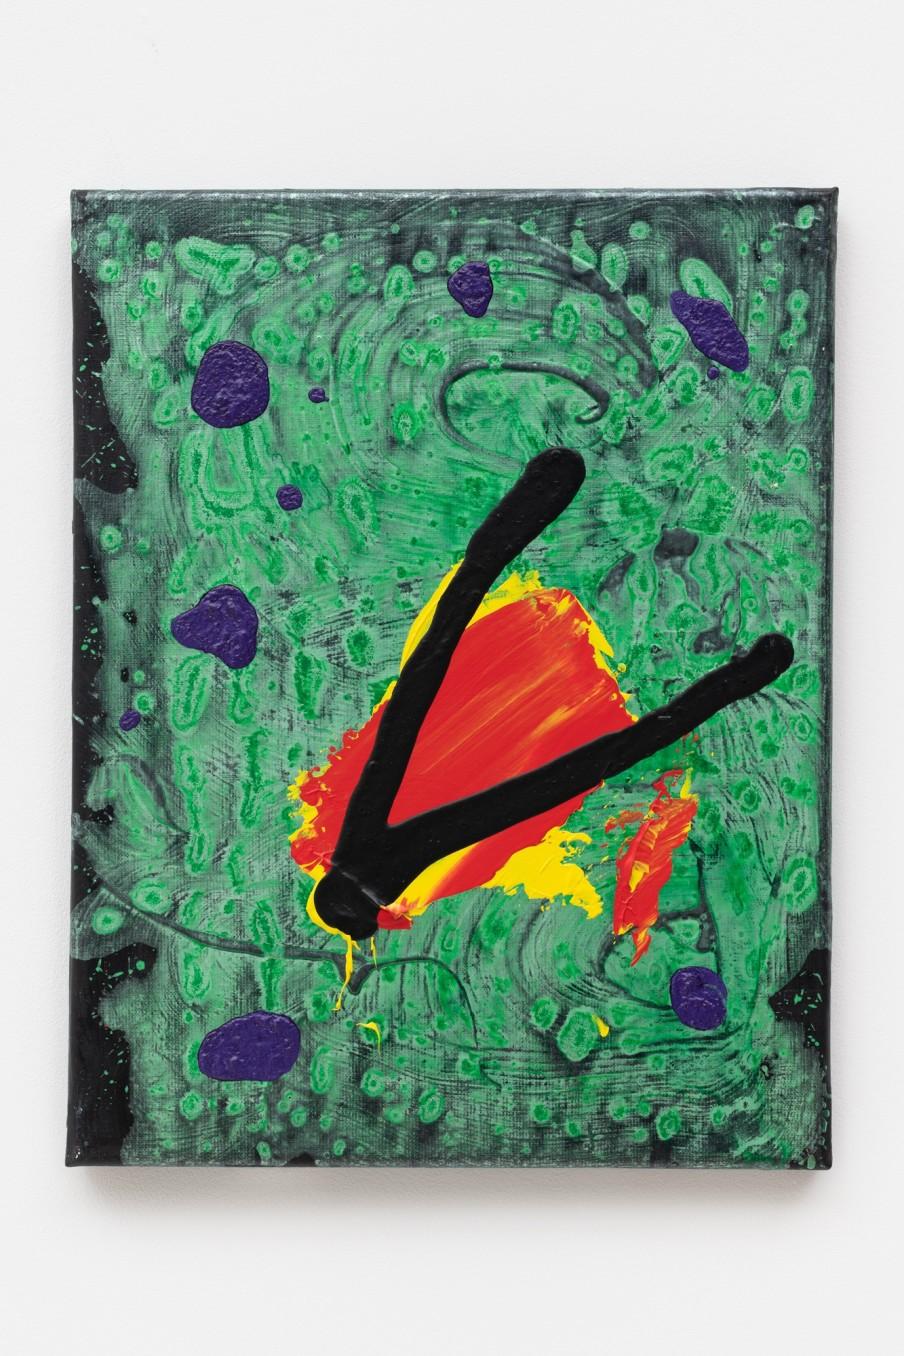 John Hoyland Damsel's Wing 25.9.05, 2005 Acrylic on canvas 45.7 x 35.6 cm 18 x 14 in